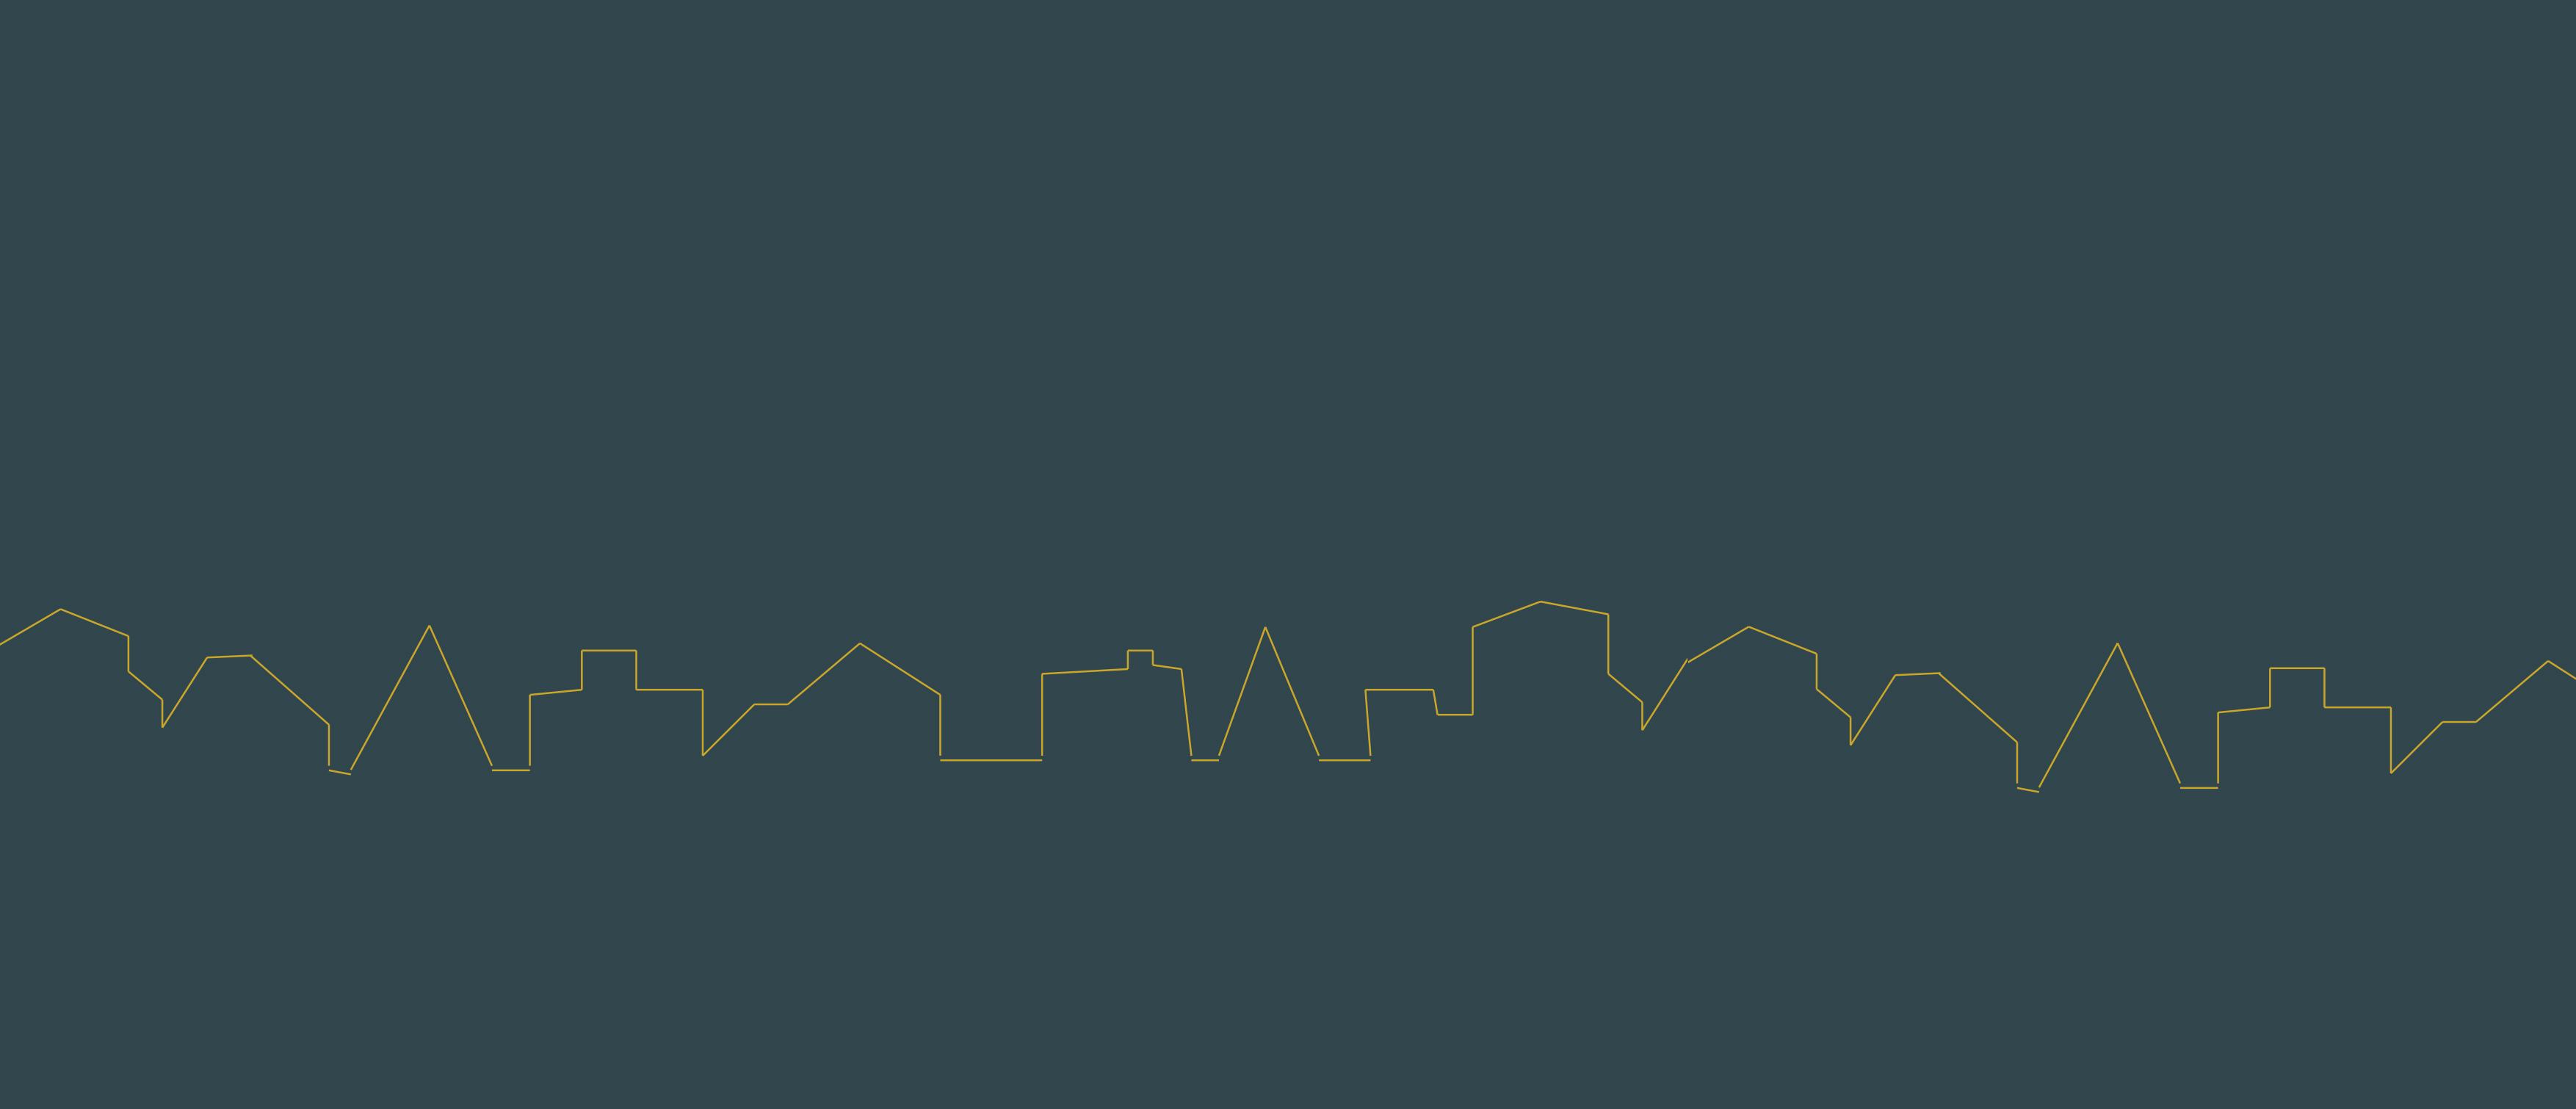 Lwów, לעמבערג, Львів, Lemberg'43: The City that did (not) Survive